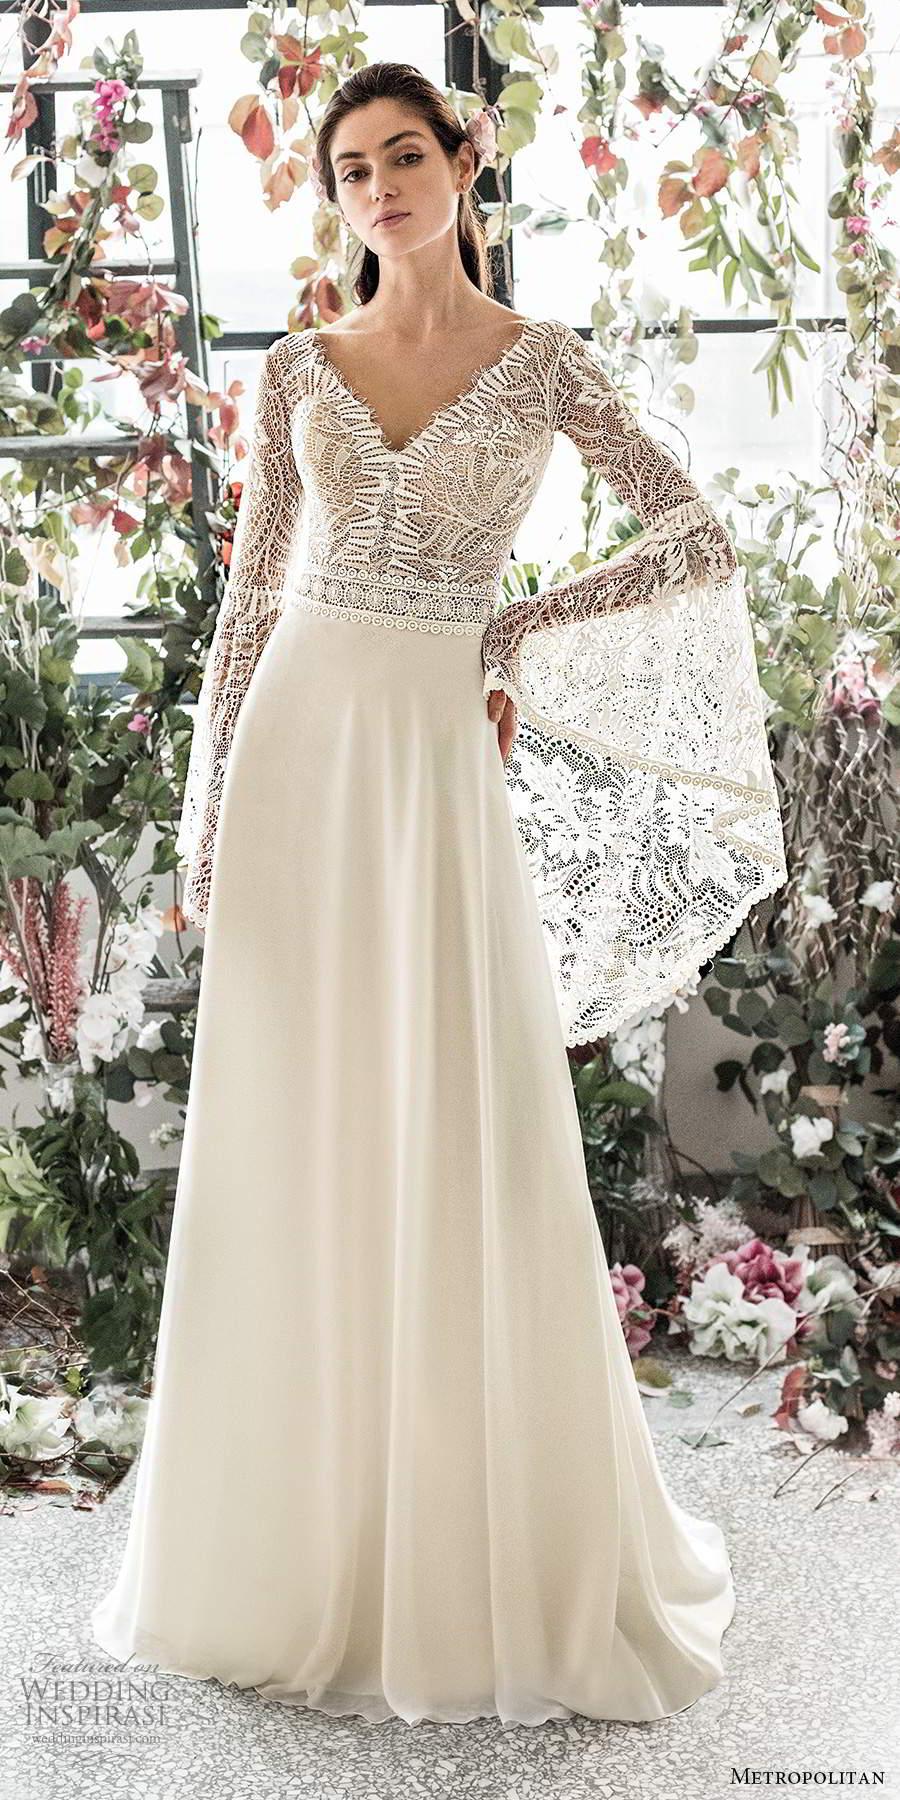 metropolitan spring 2020 bridal illusion long flare sleeves v neckline embellished lace bodice boho chic a line wedding dress v back chapel train (11) mv